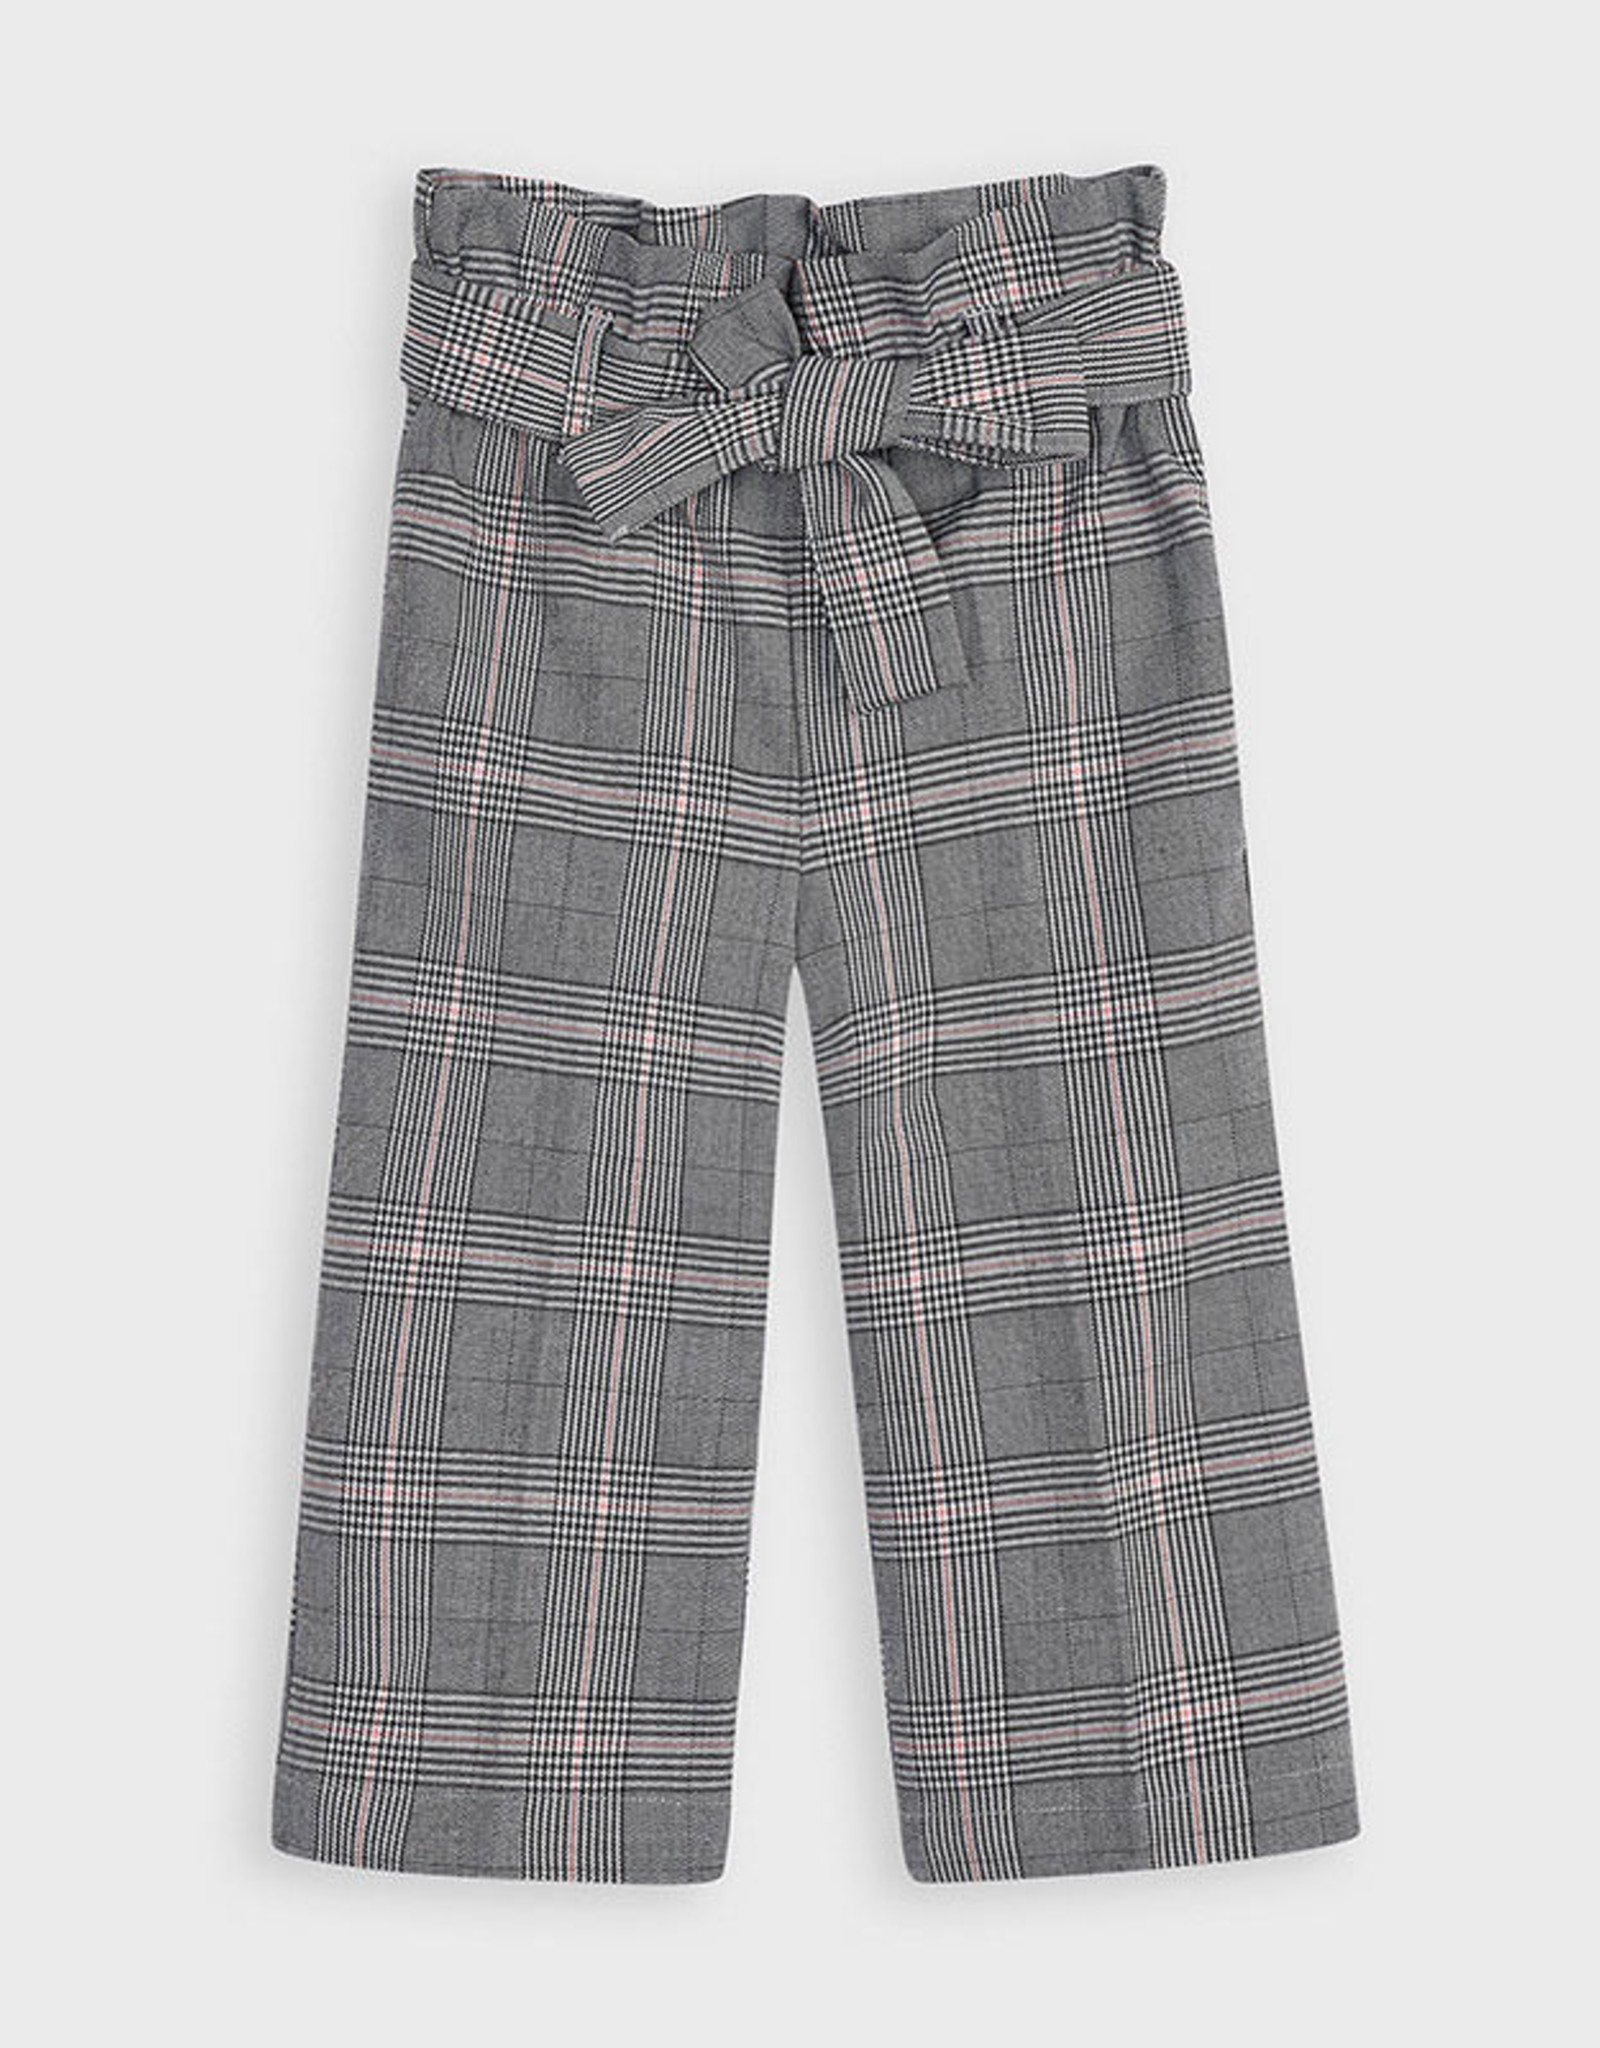 Mayoral FA20 Grey Cropped Checked Pant